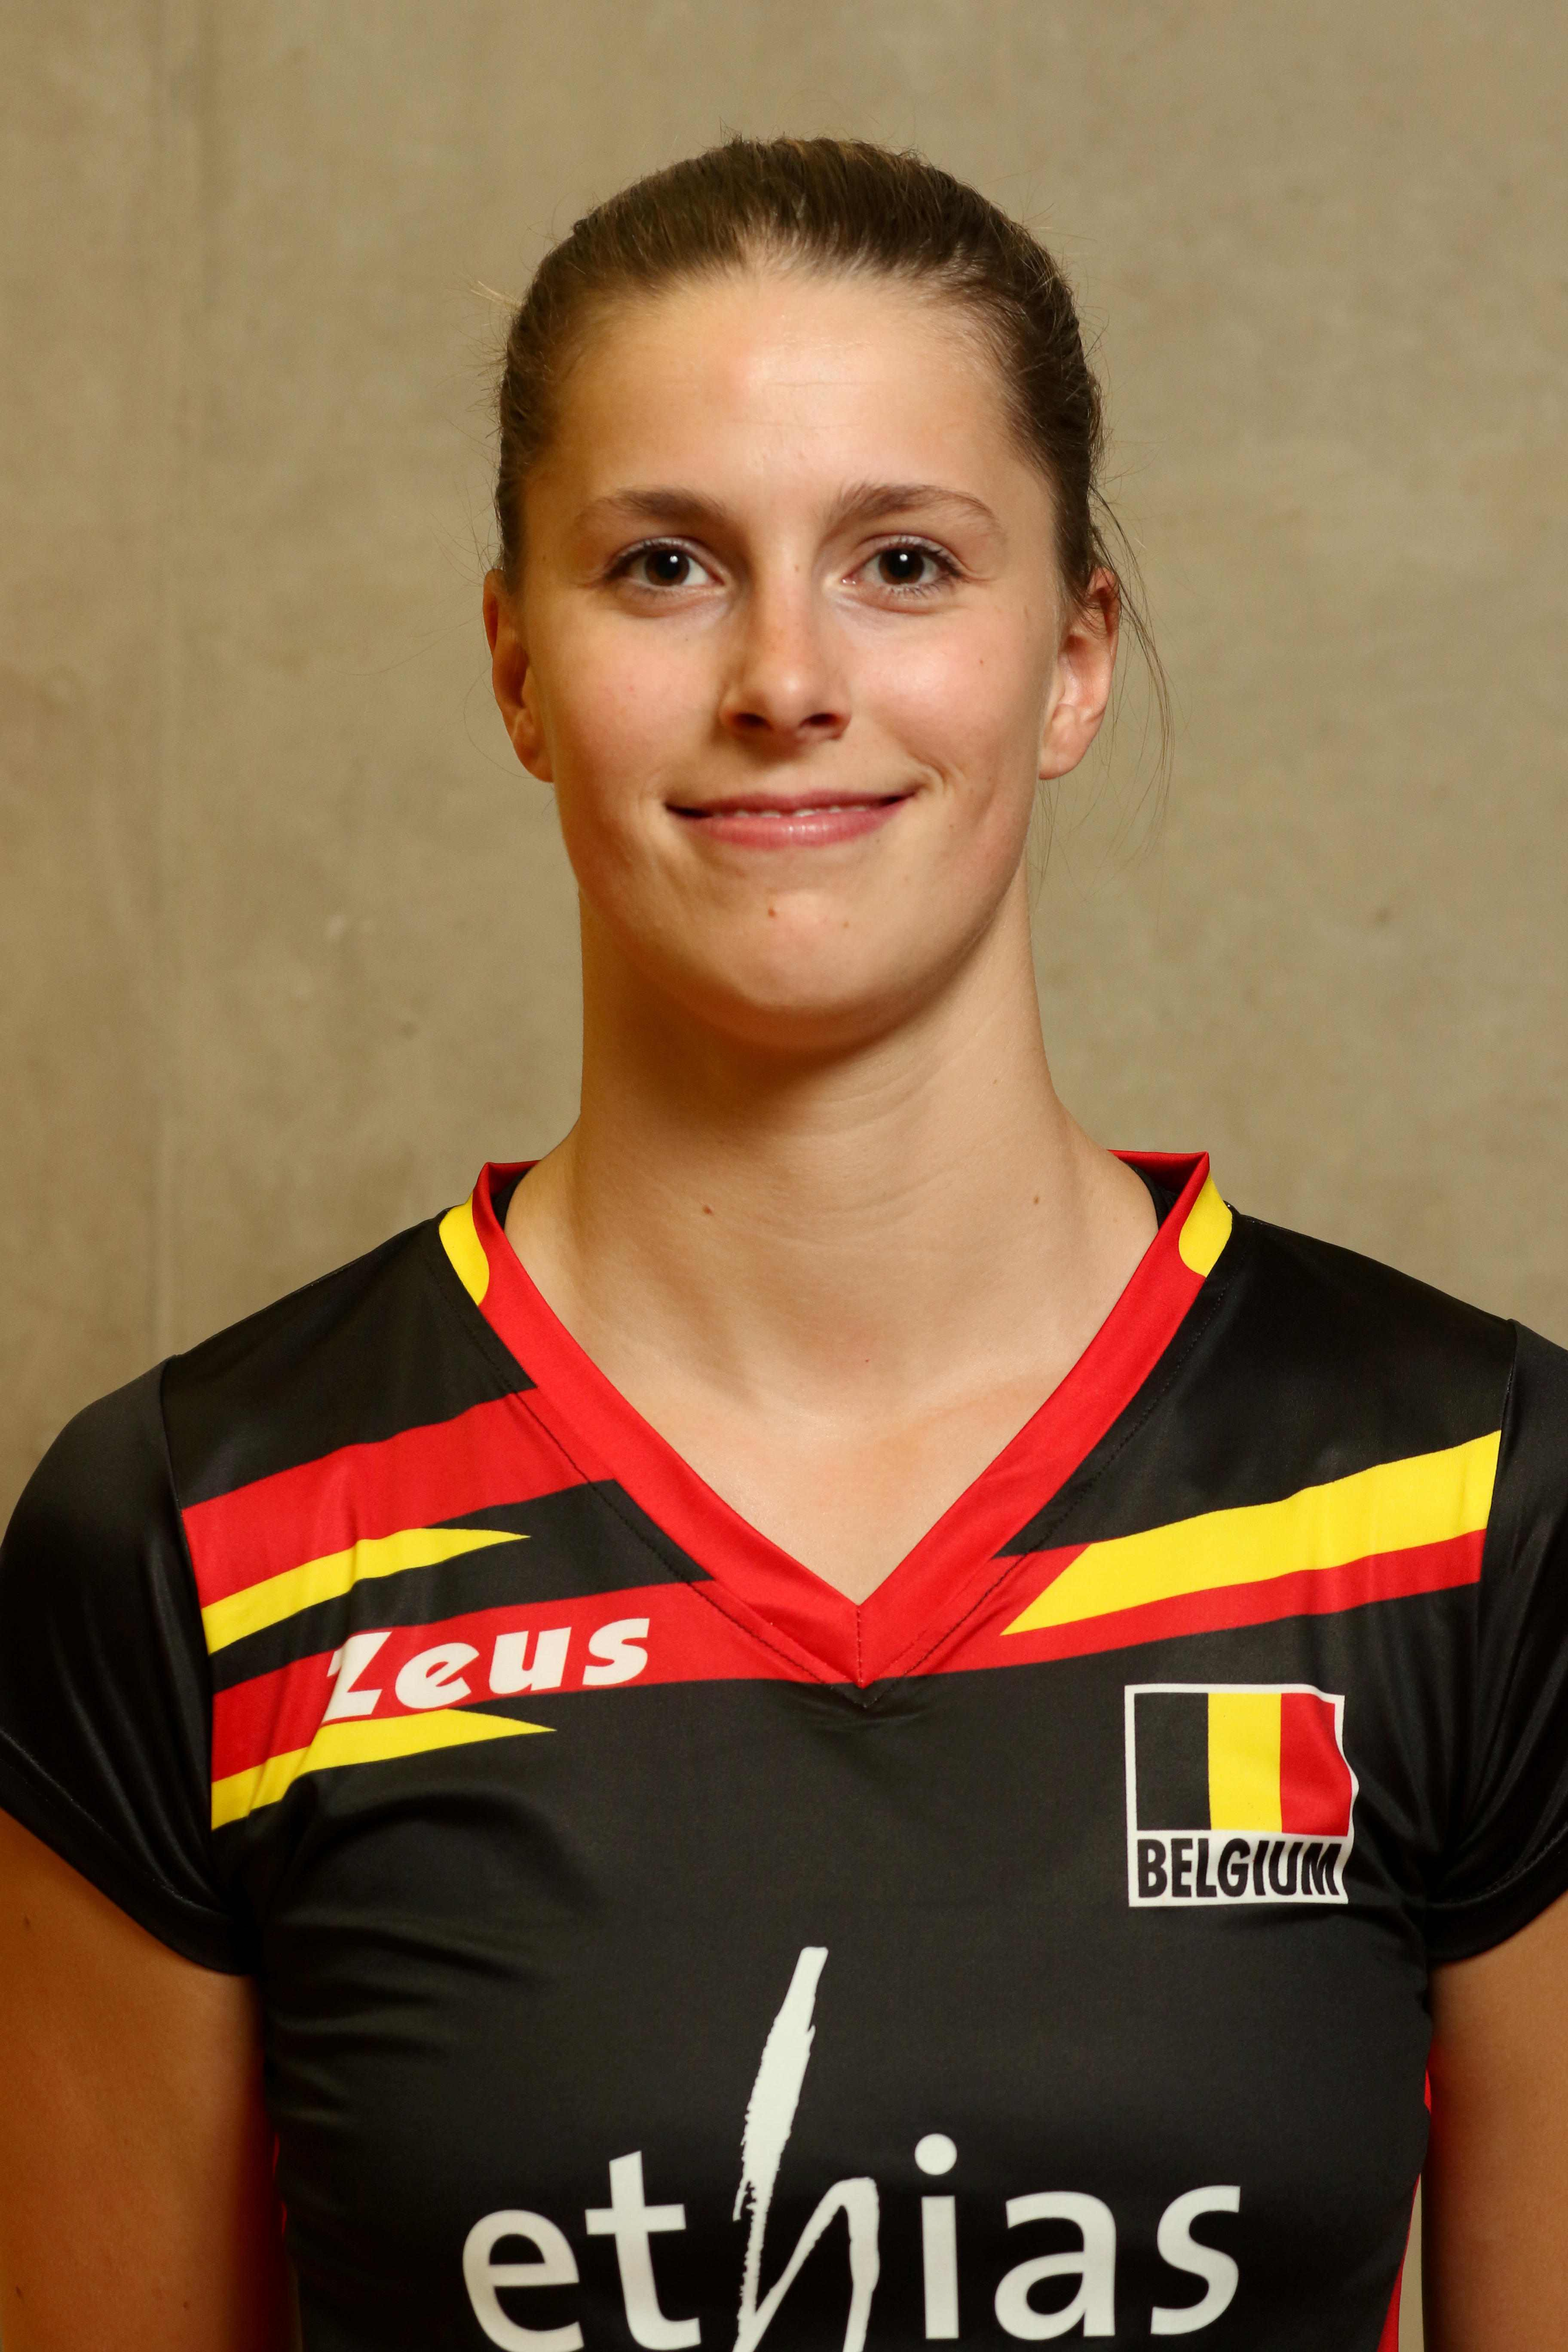 Laura Heyrman